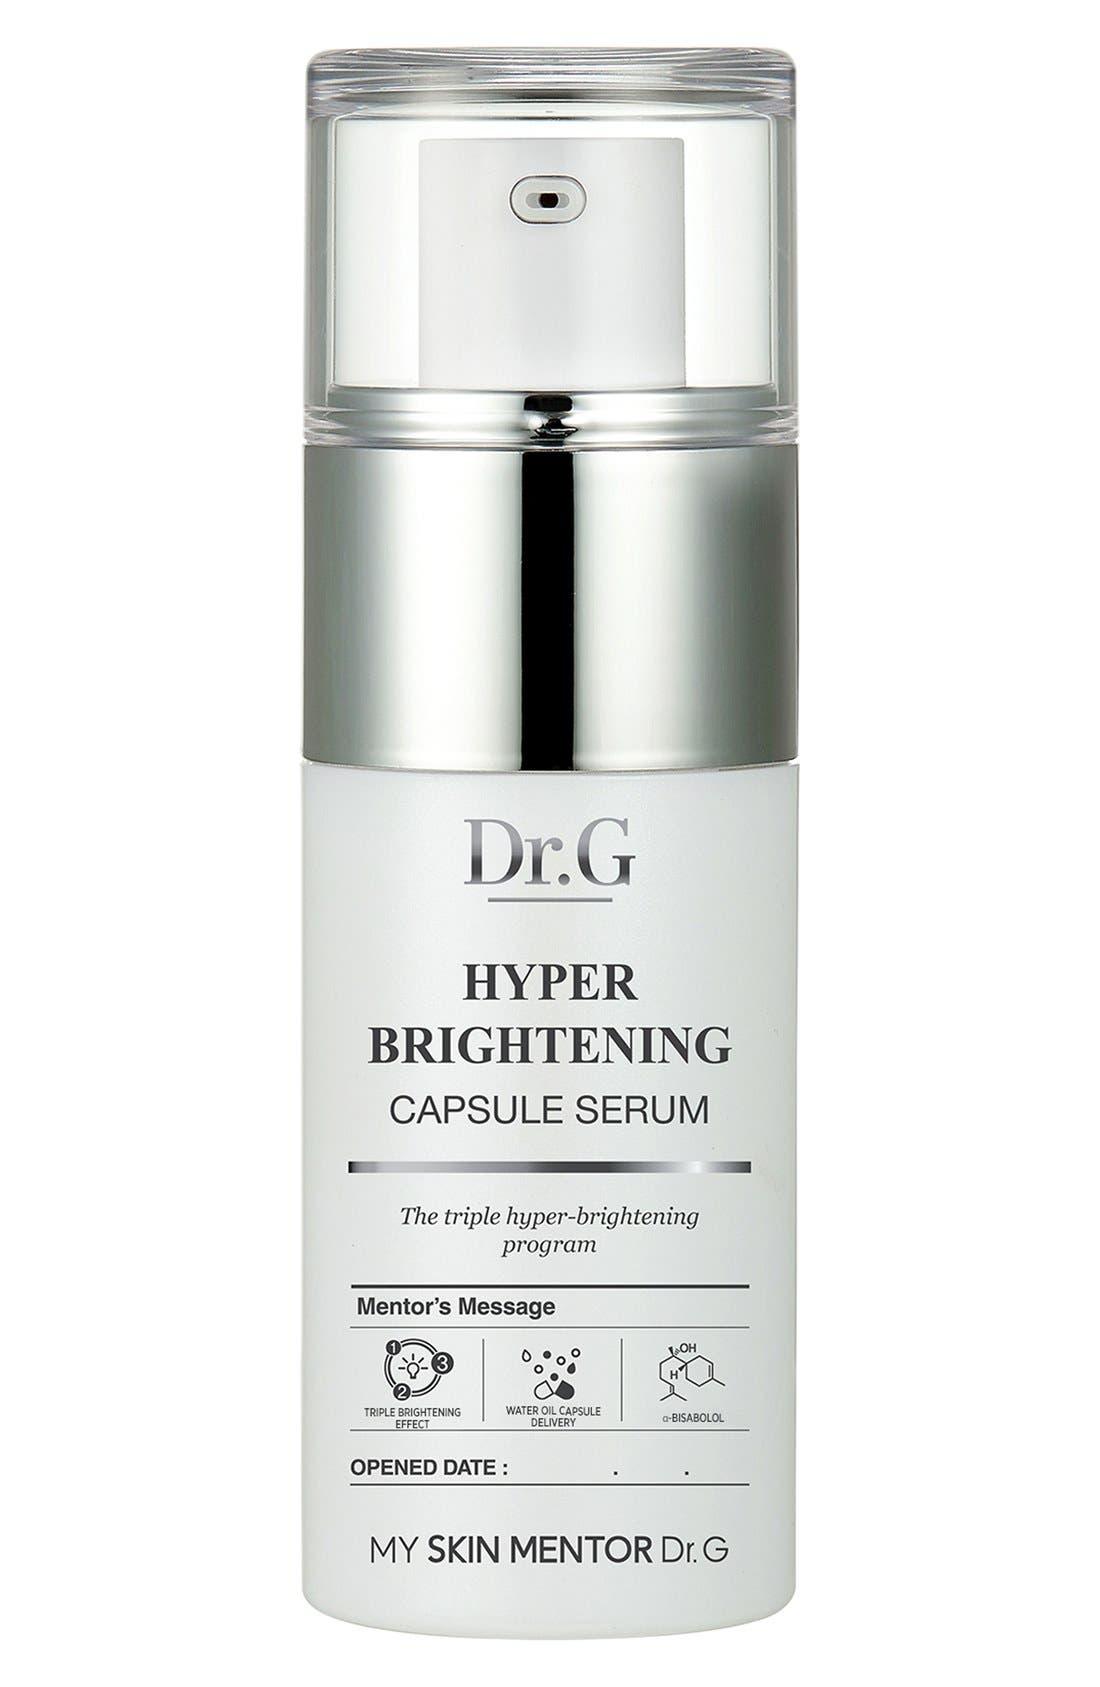 My Skin Mentor Dr. G Beauty Hyper Brighten Capsule Serum (Nordstrom Exclusive)